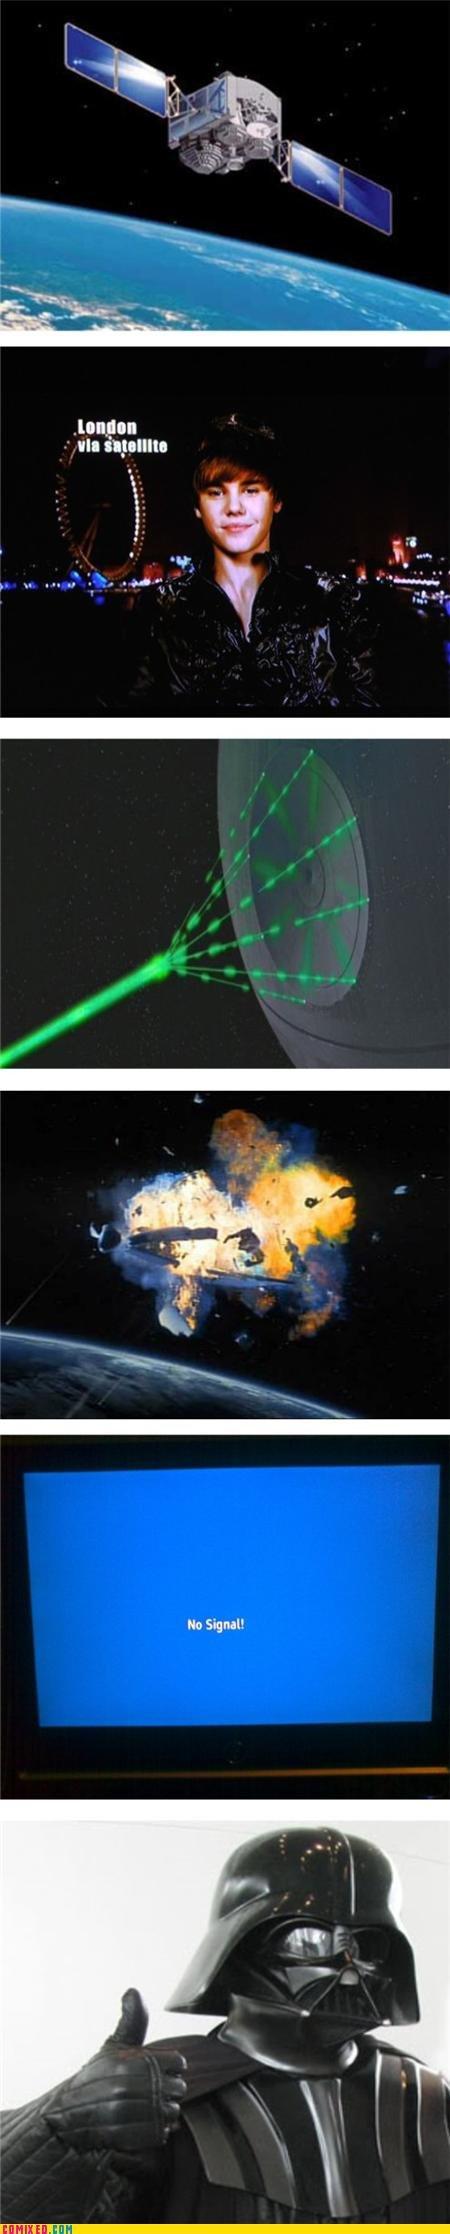 The dark side will fix it. . tnngnn ill no Signal!. thank you Mr. Vader